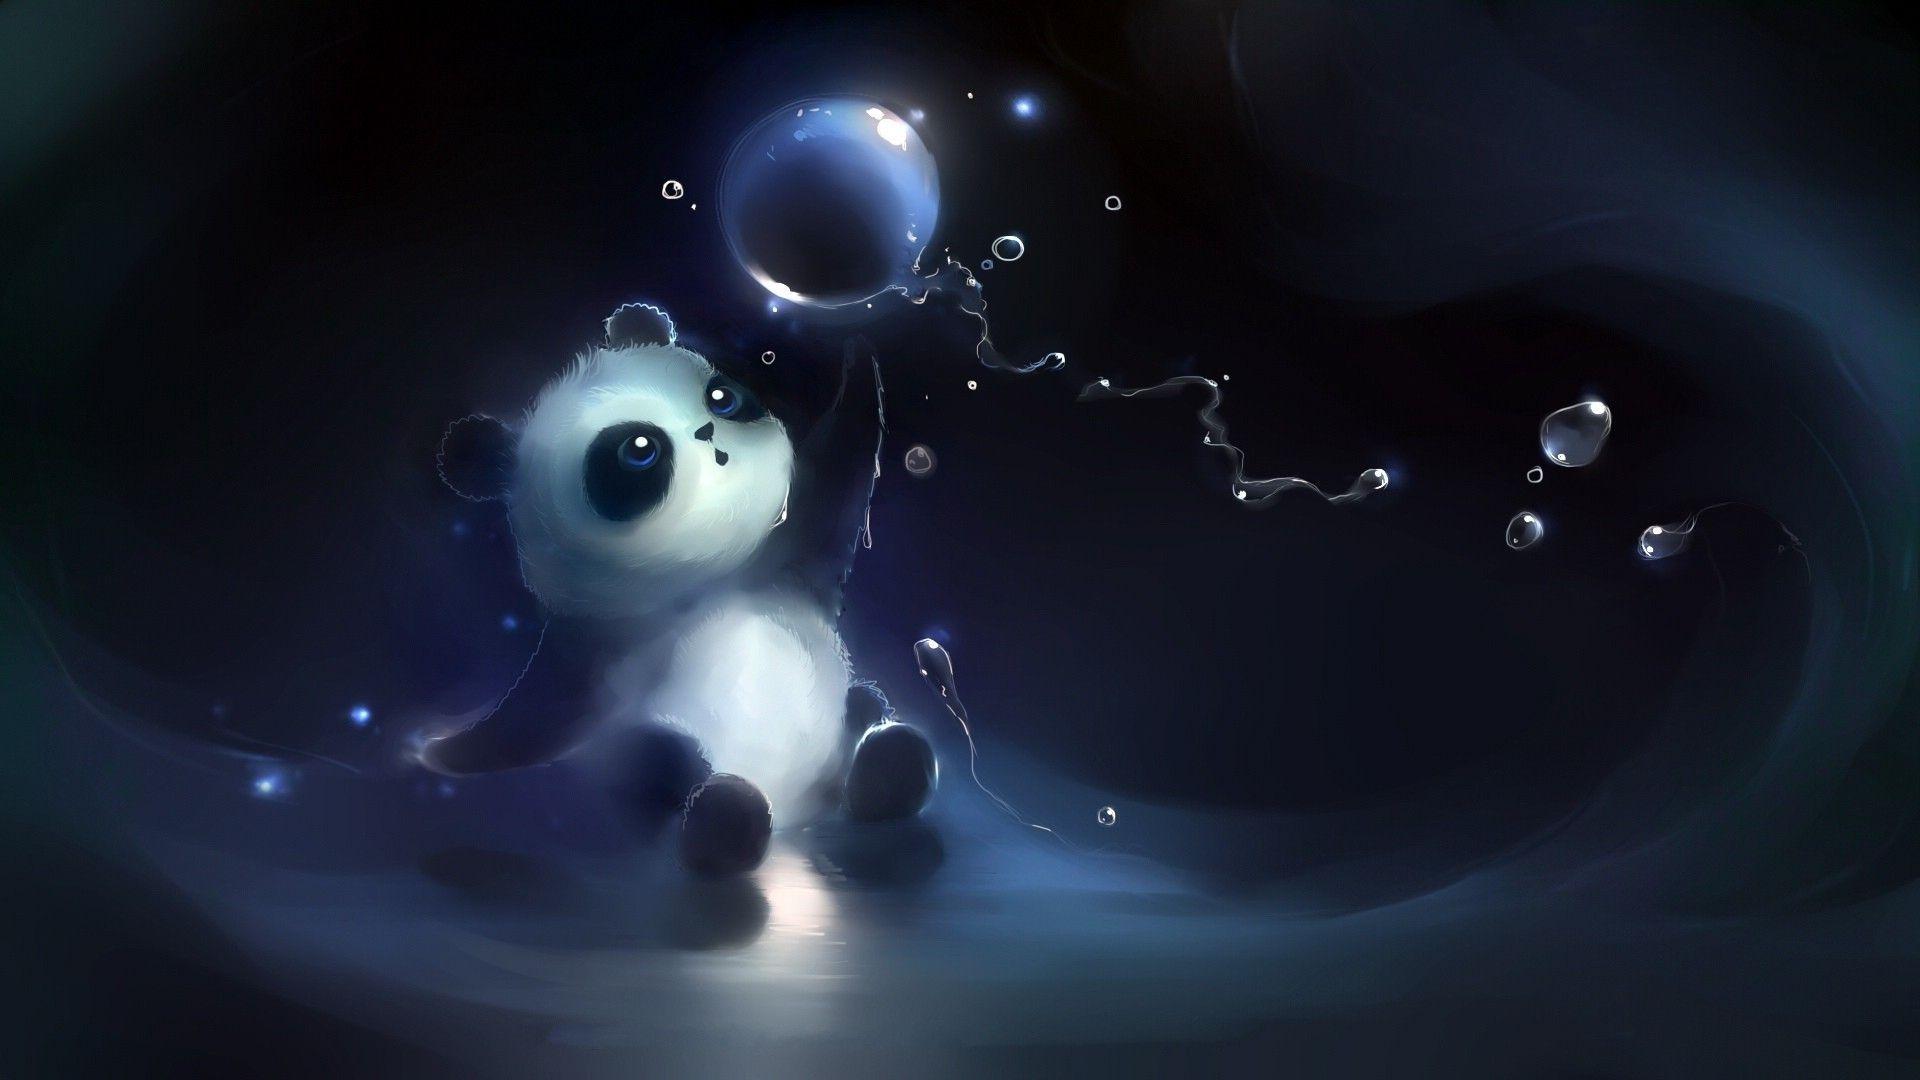 Kung Fu Panda IPhone Desktop Wallpapers HD 1024x768 Pics 38